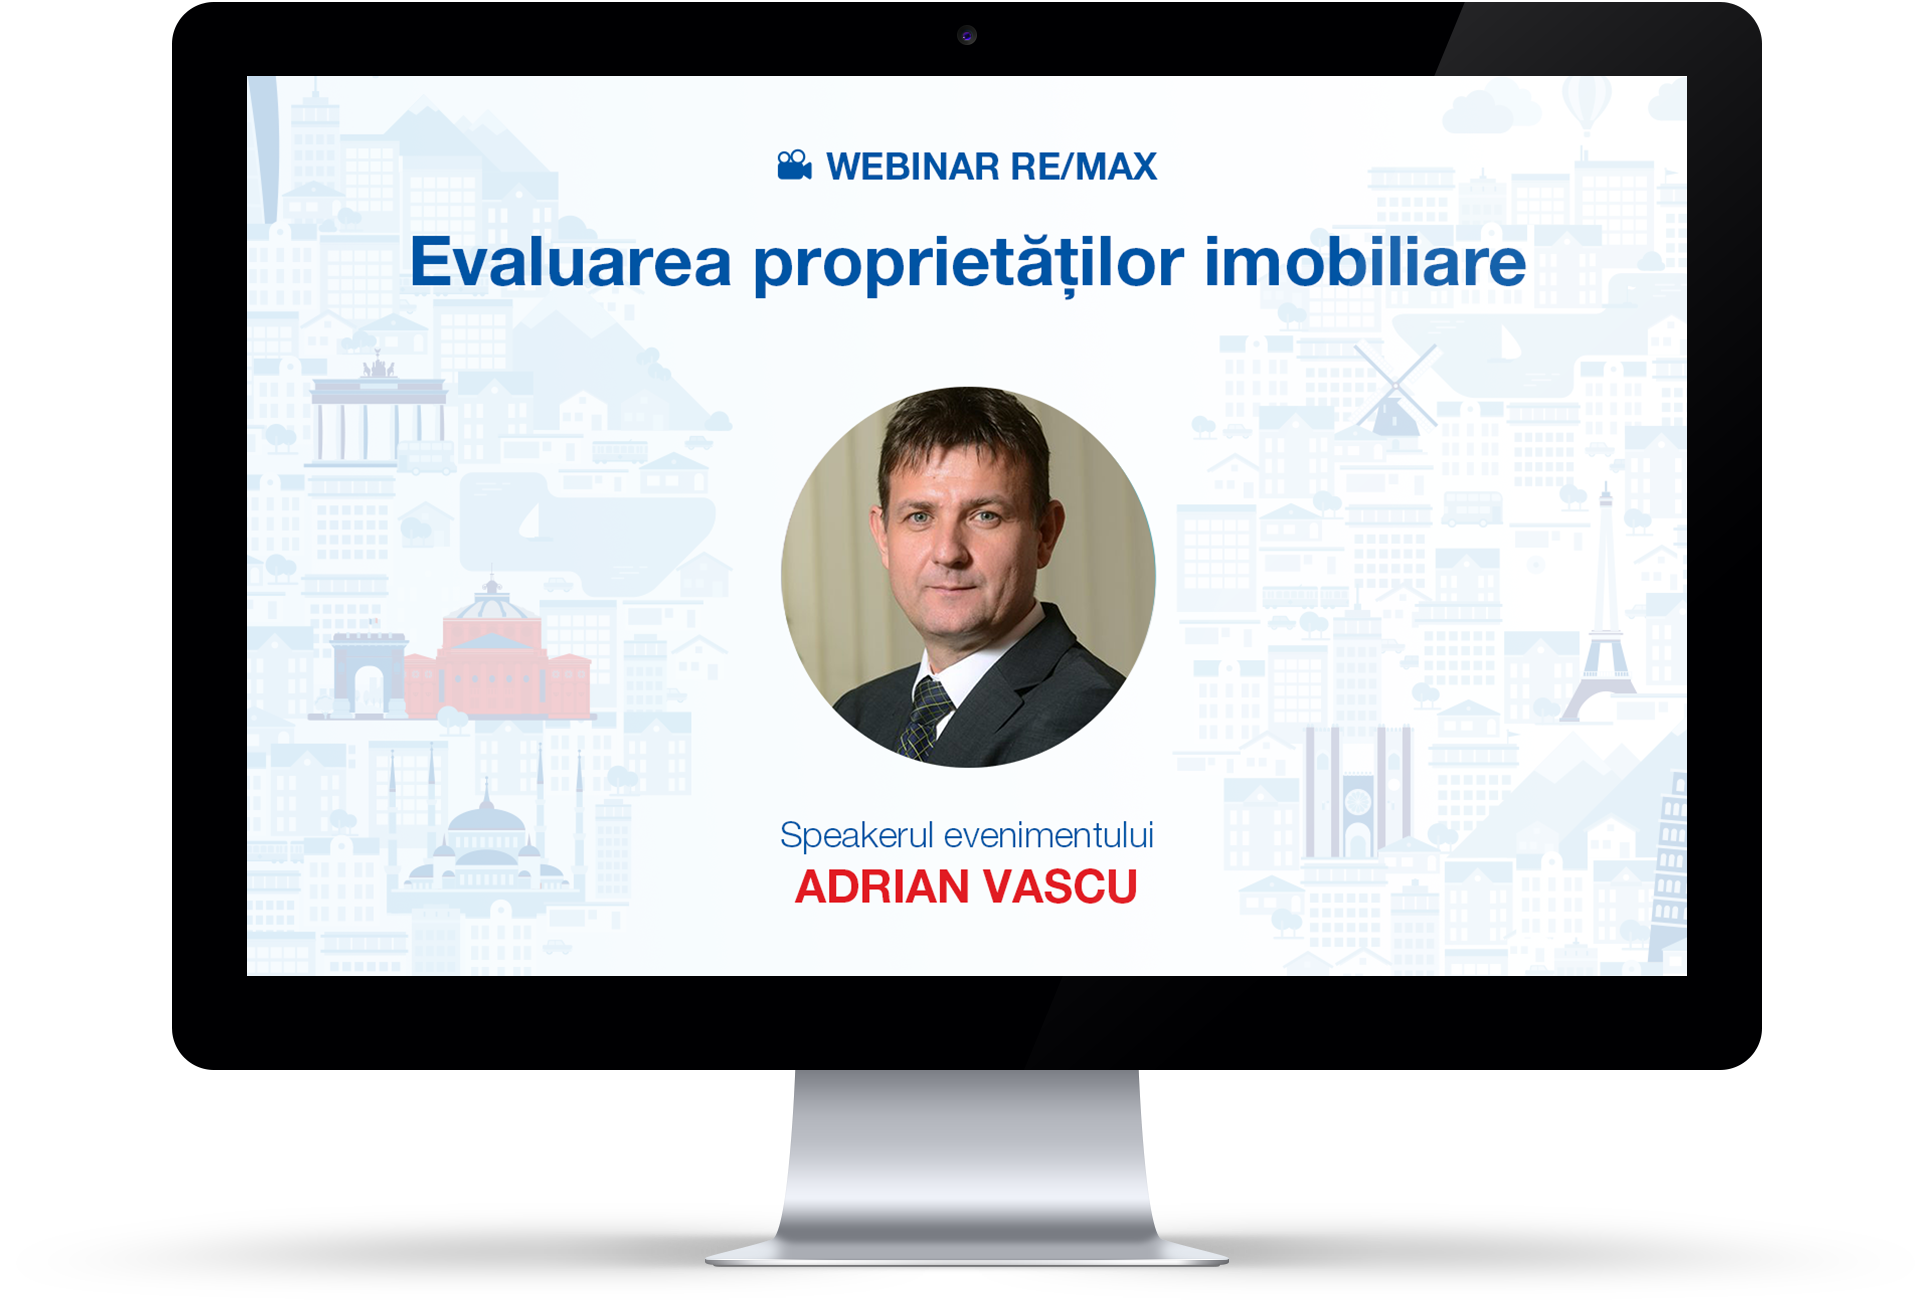 webinar-adrian-vascu-iMac-Mock-up.png